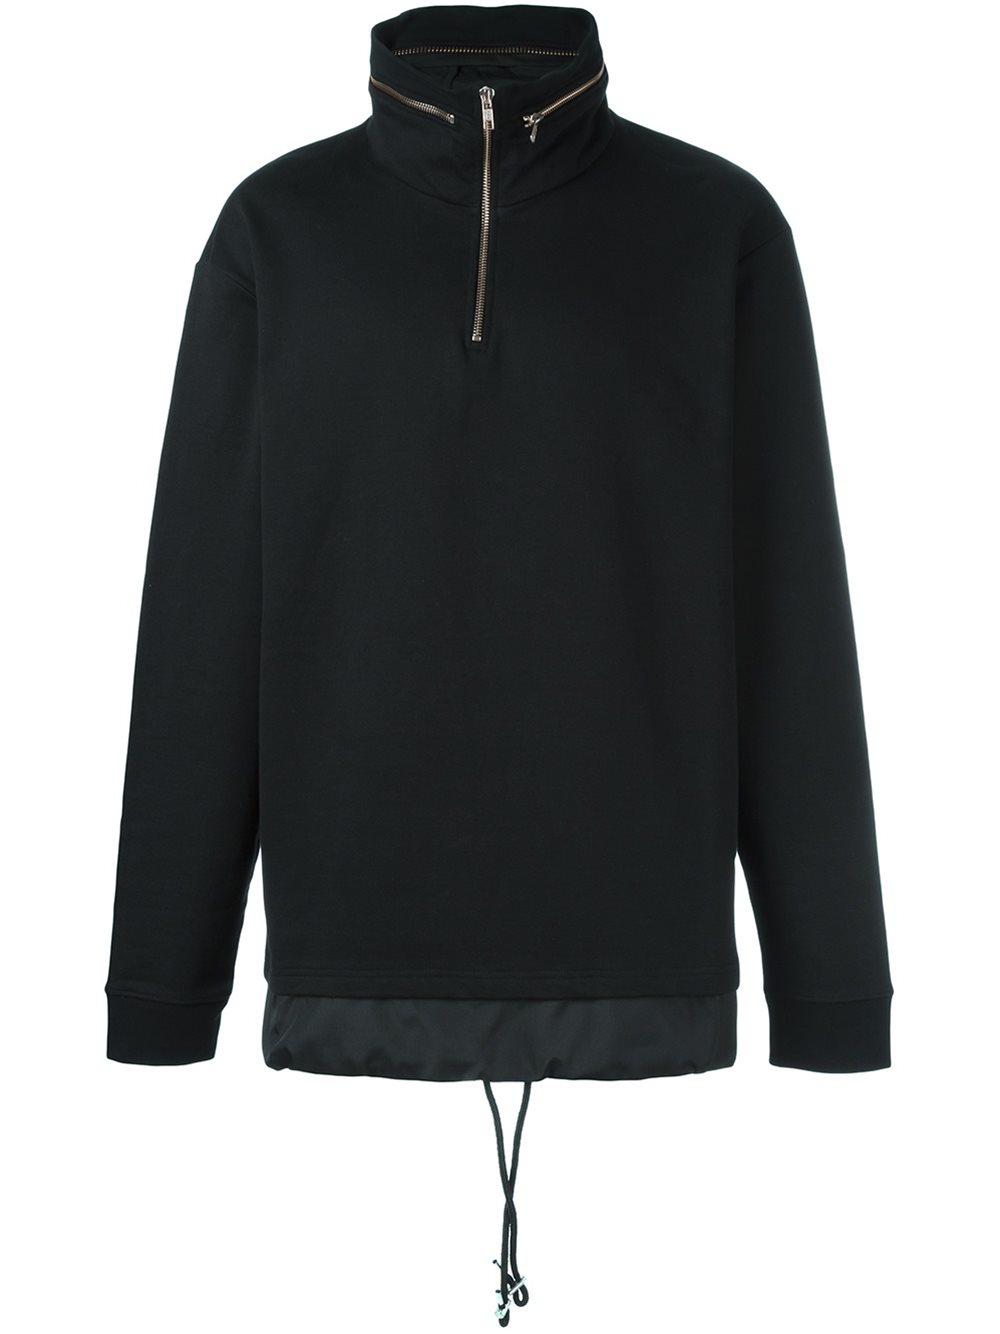 mcq alexander mcqueen zipped collar hoodie in black for men lyst. Black Bedroom Furniture Sets. Home Design Ideas